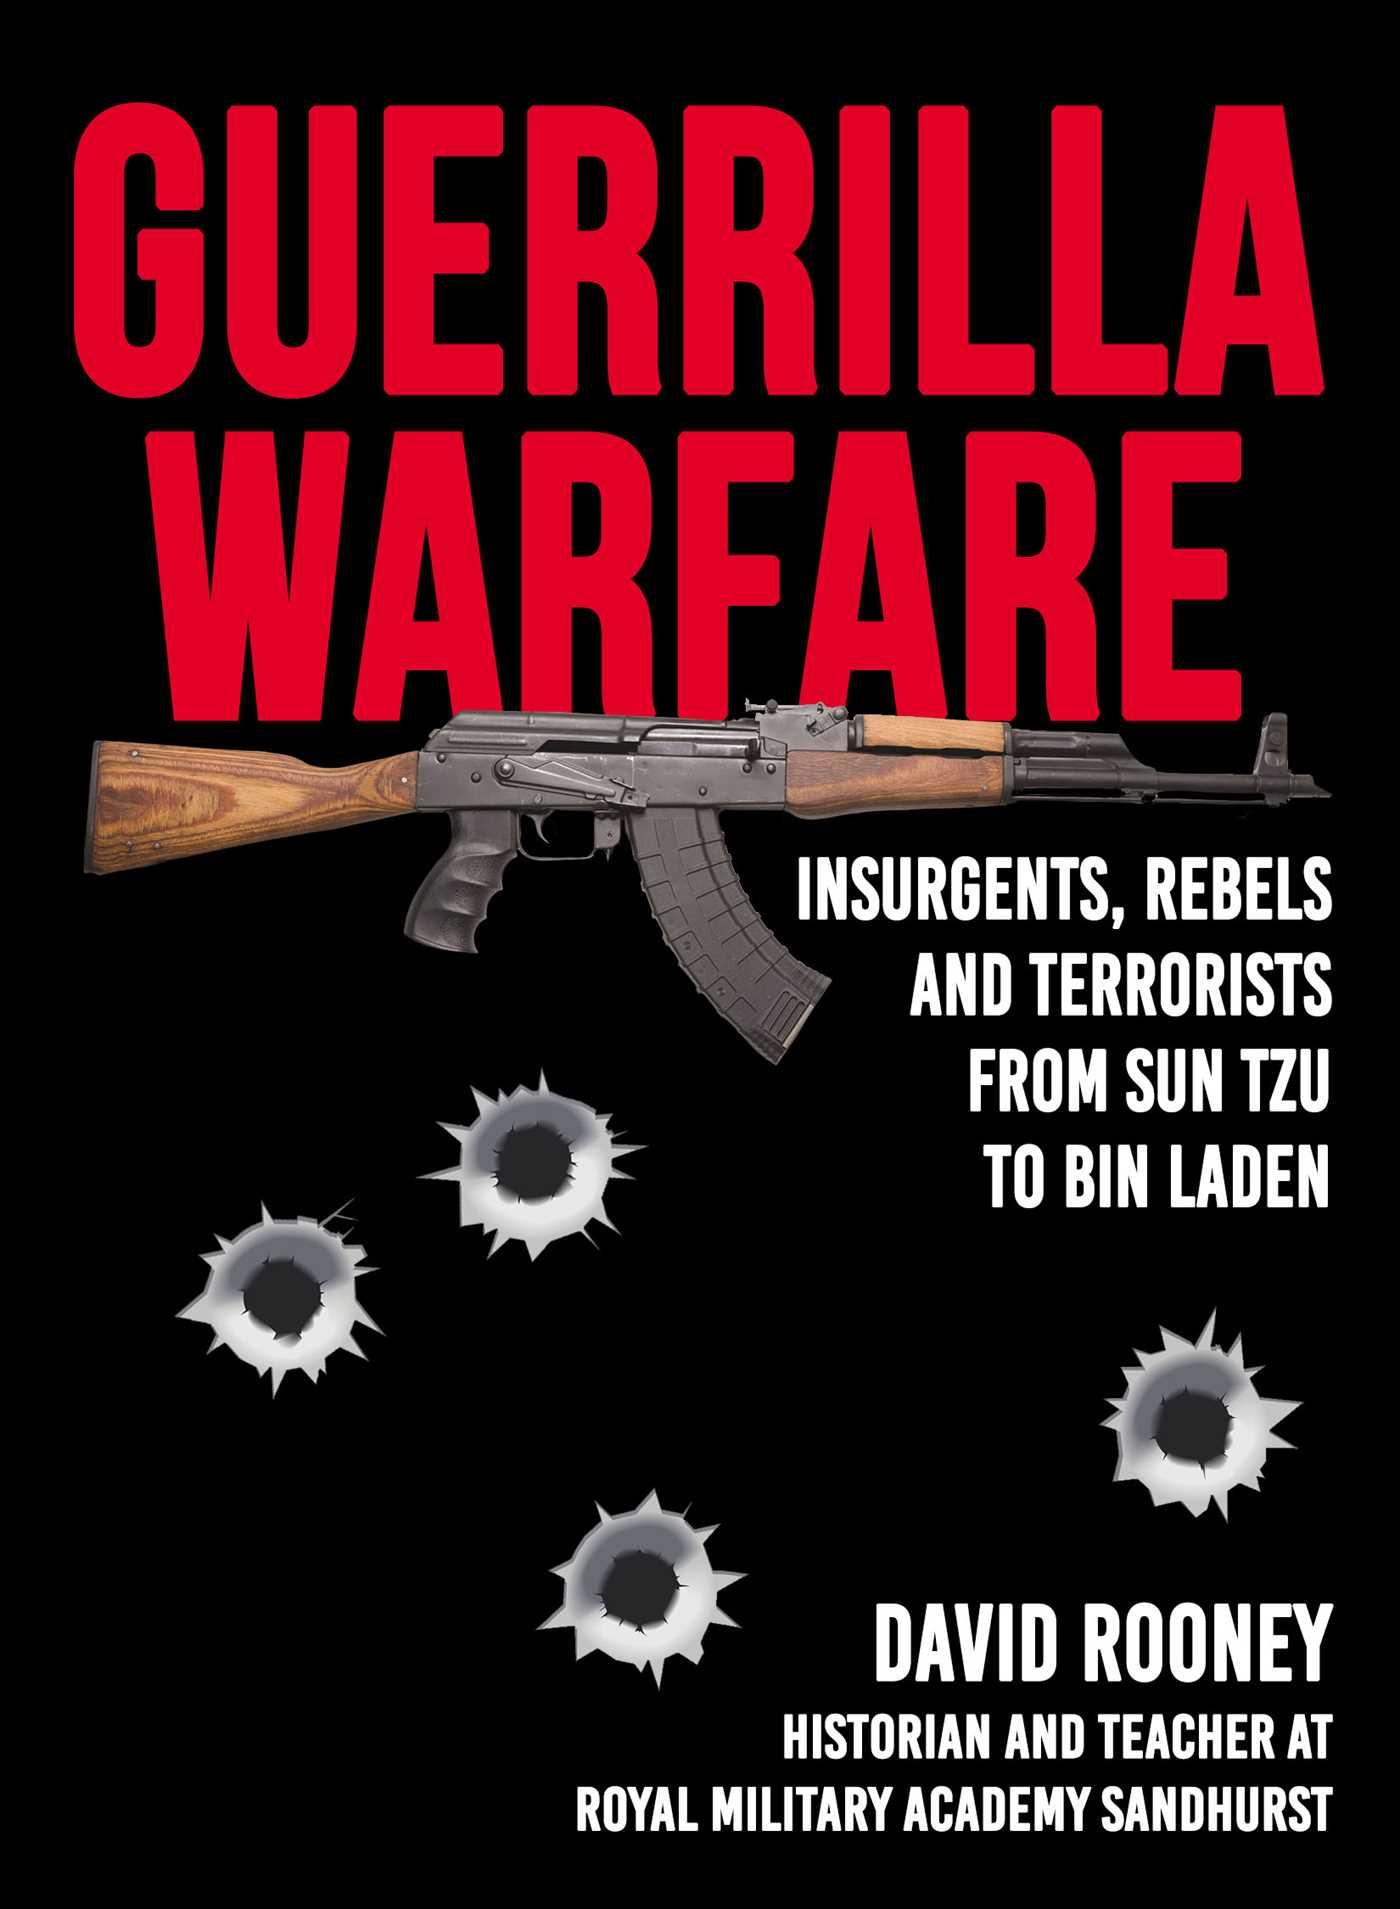 Guerrilla Warfare: Insurgents, Rebels, and Terrorists from Sun Tzu to Bin Laden